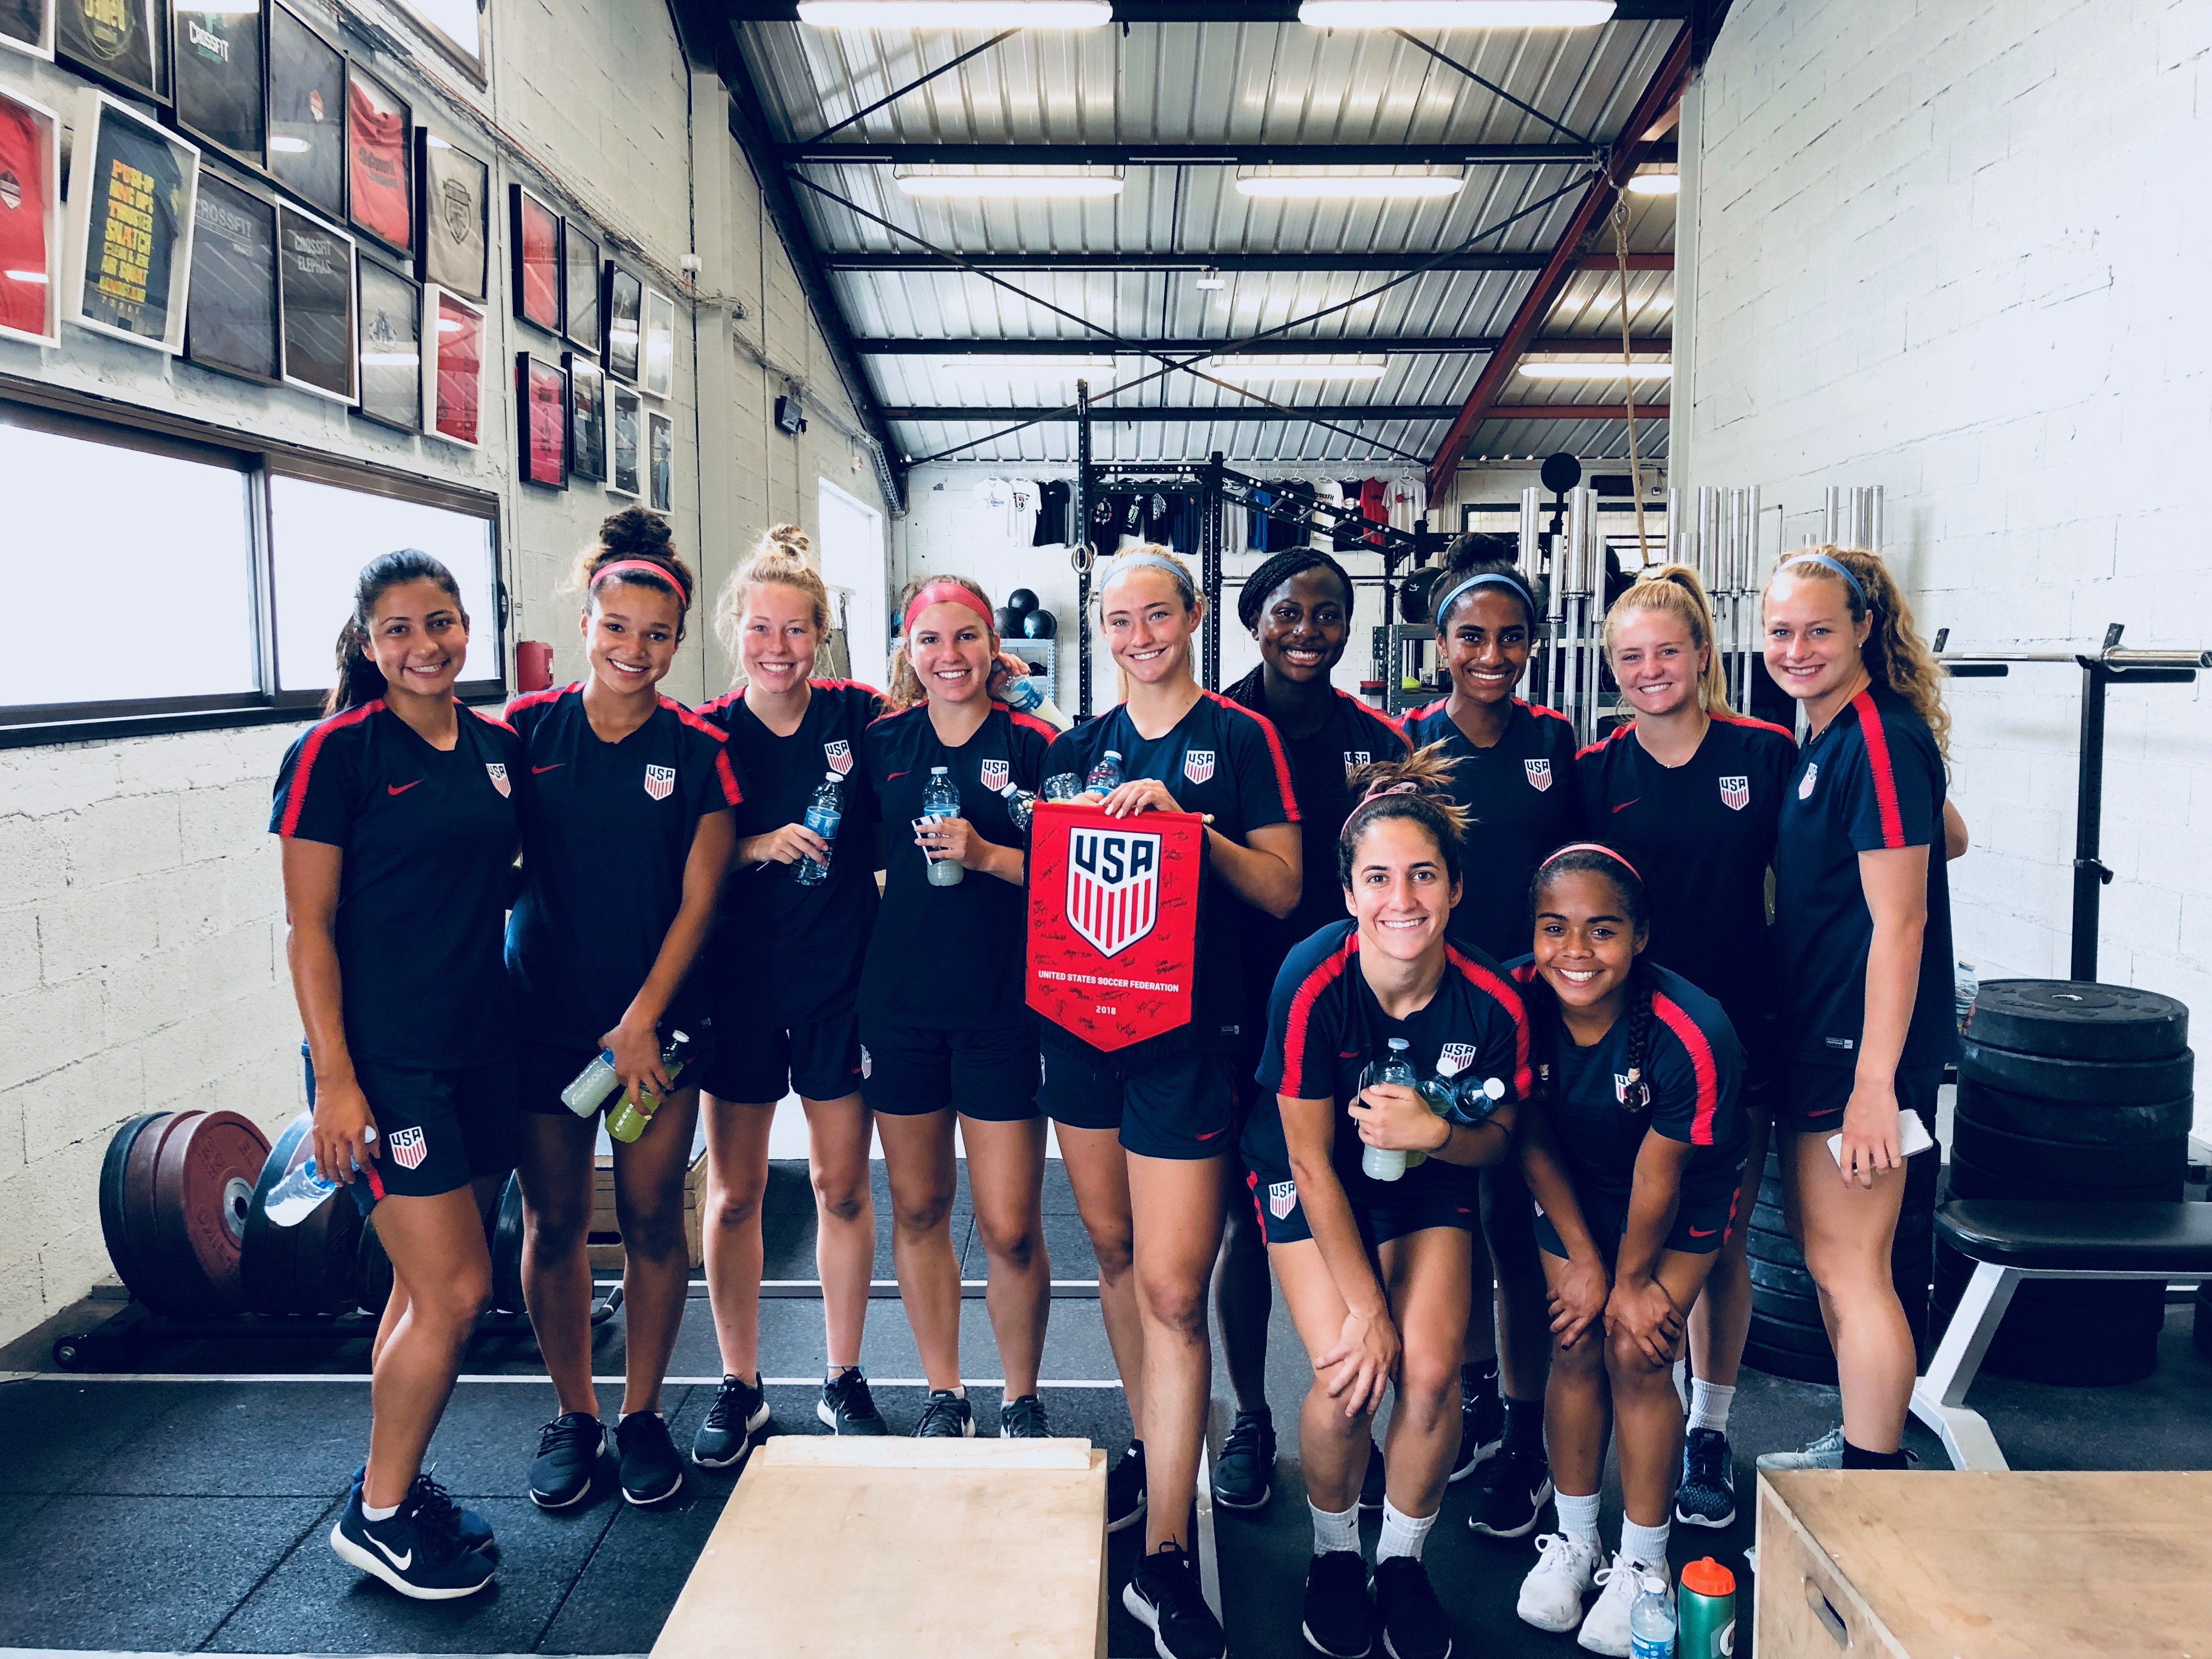 L'équipe de football junior des USA chez CrossFit Avignon